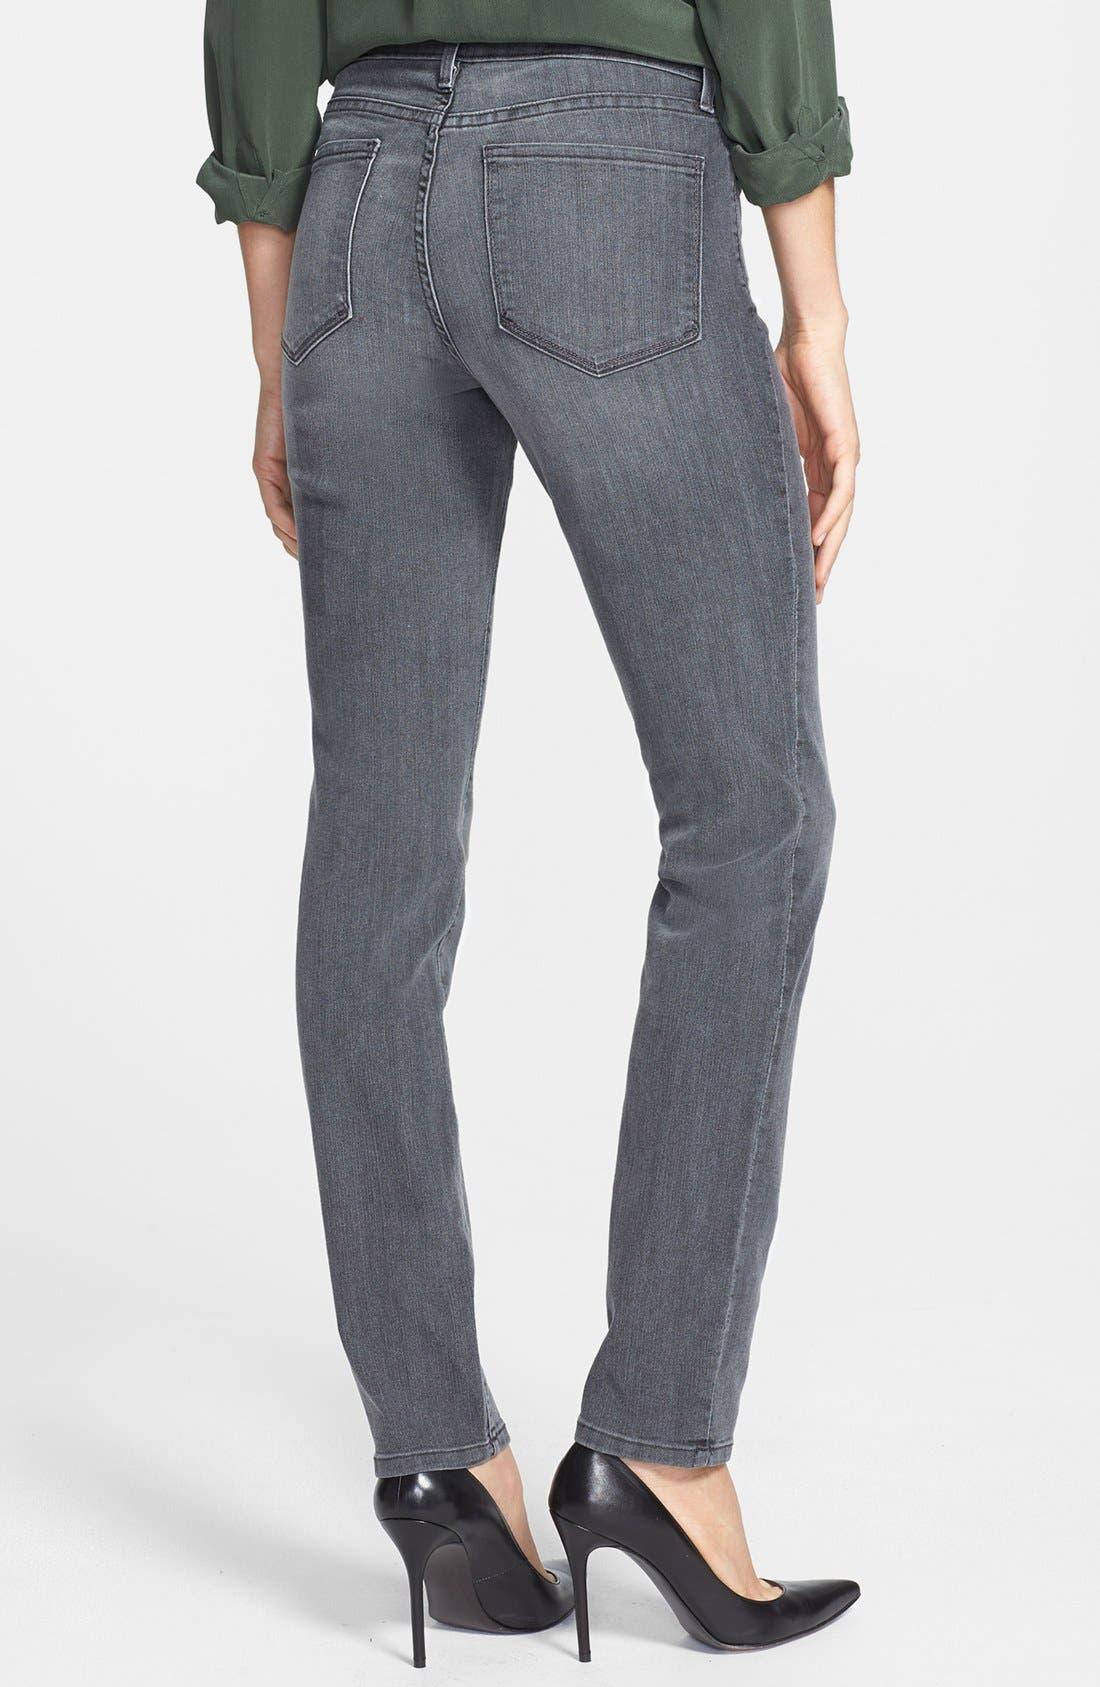 Alternate Image 2  - NYDJ 'Alina' Stretch Skinny Jeans (Basalt) (Petite)